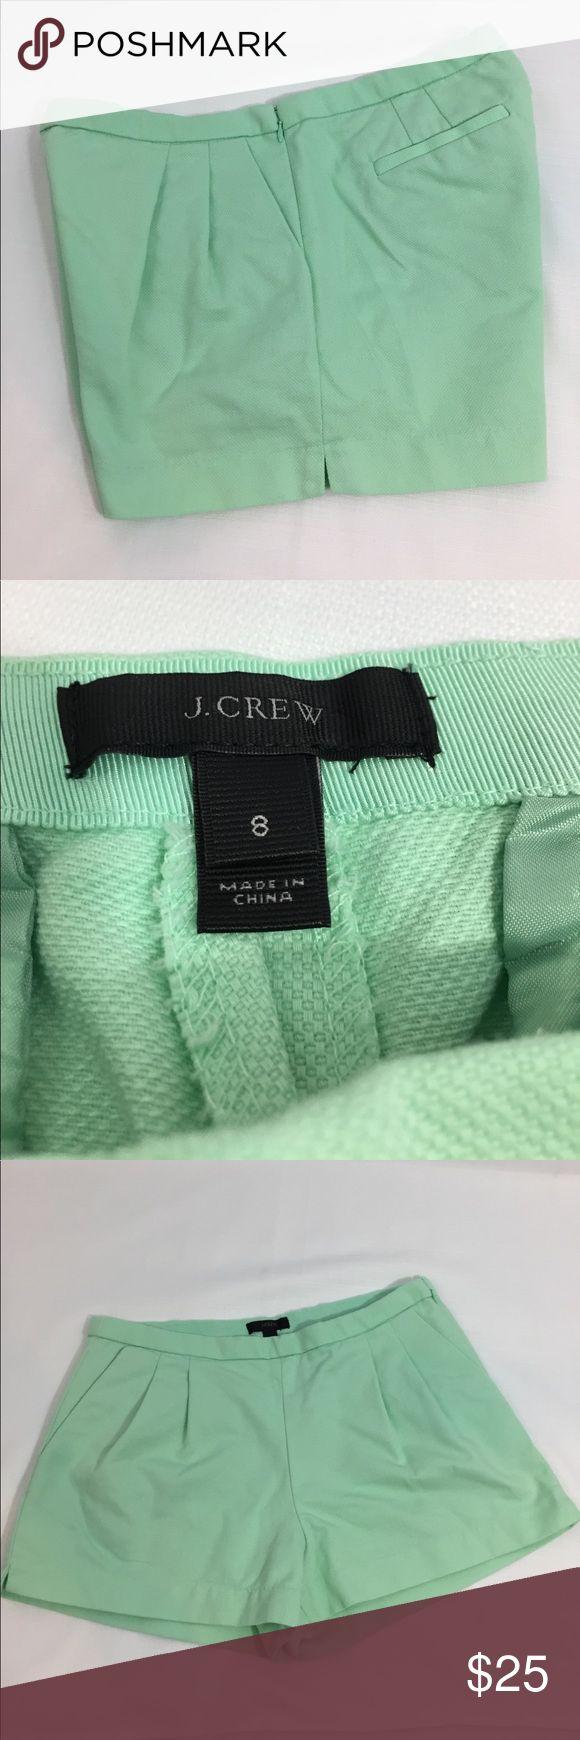 "J. Crew mint green dressy shorts sz 8 side zip Pretty spring green shorts from J. Crew sz 8.  Side zip, hook and eye closure.  Approximate flat lay measurements: waist/hip 15.5"", rise 9.5"", inseam 3"". J. Crew Shorts"